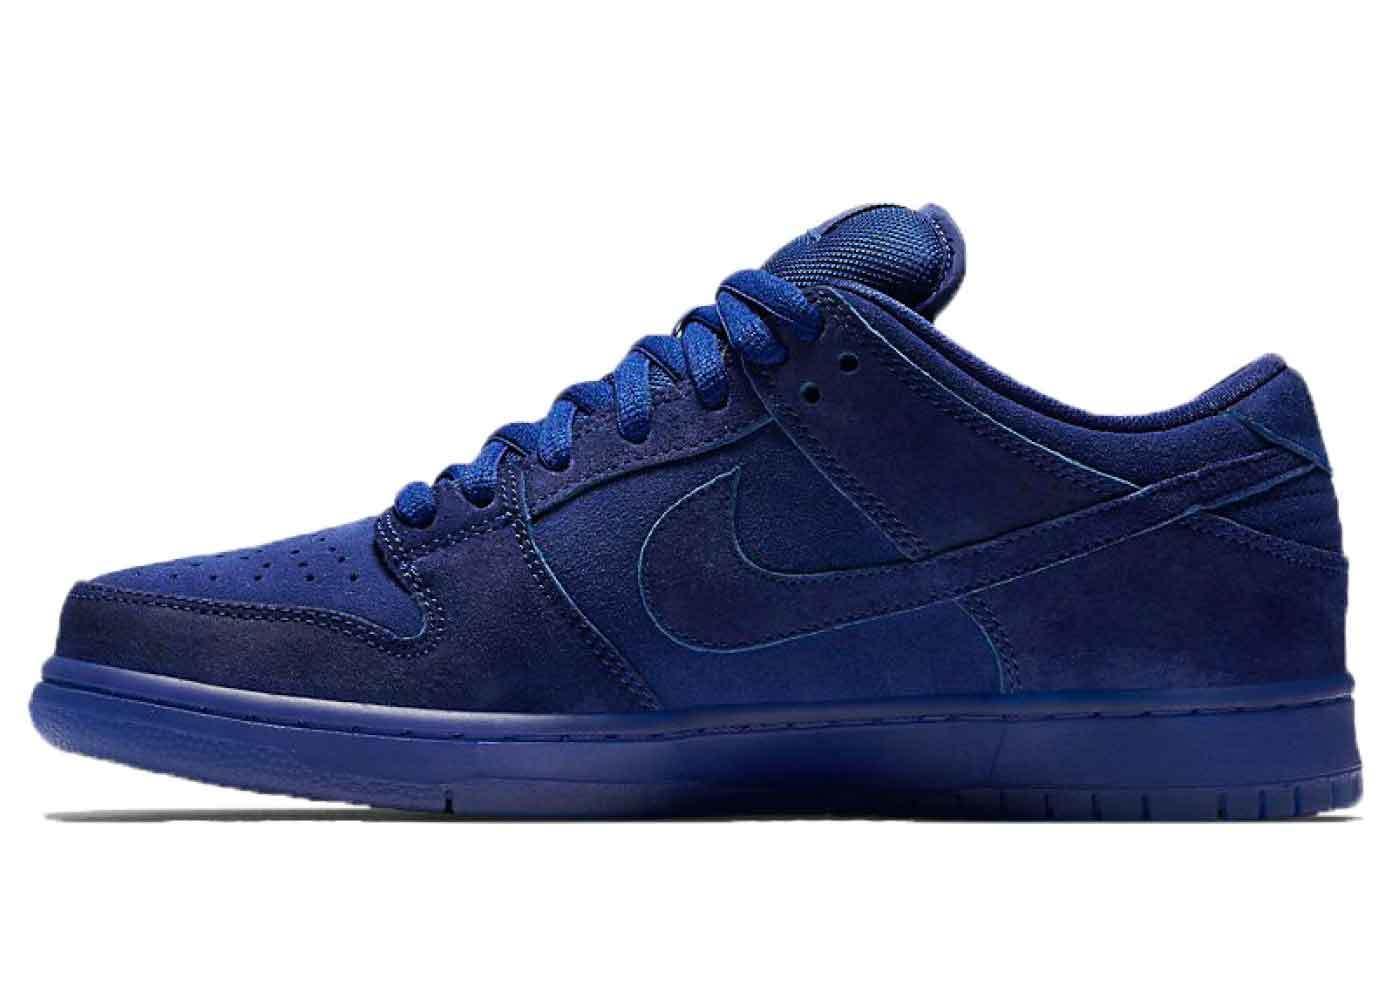 Nike SB Dunk Low Blue Moonの写真